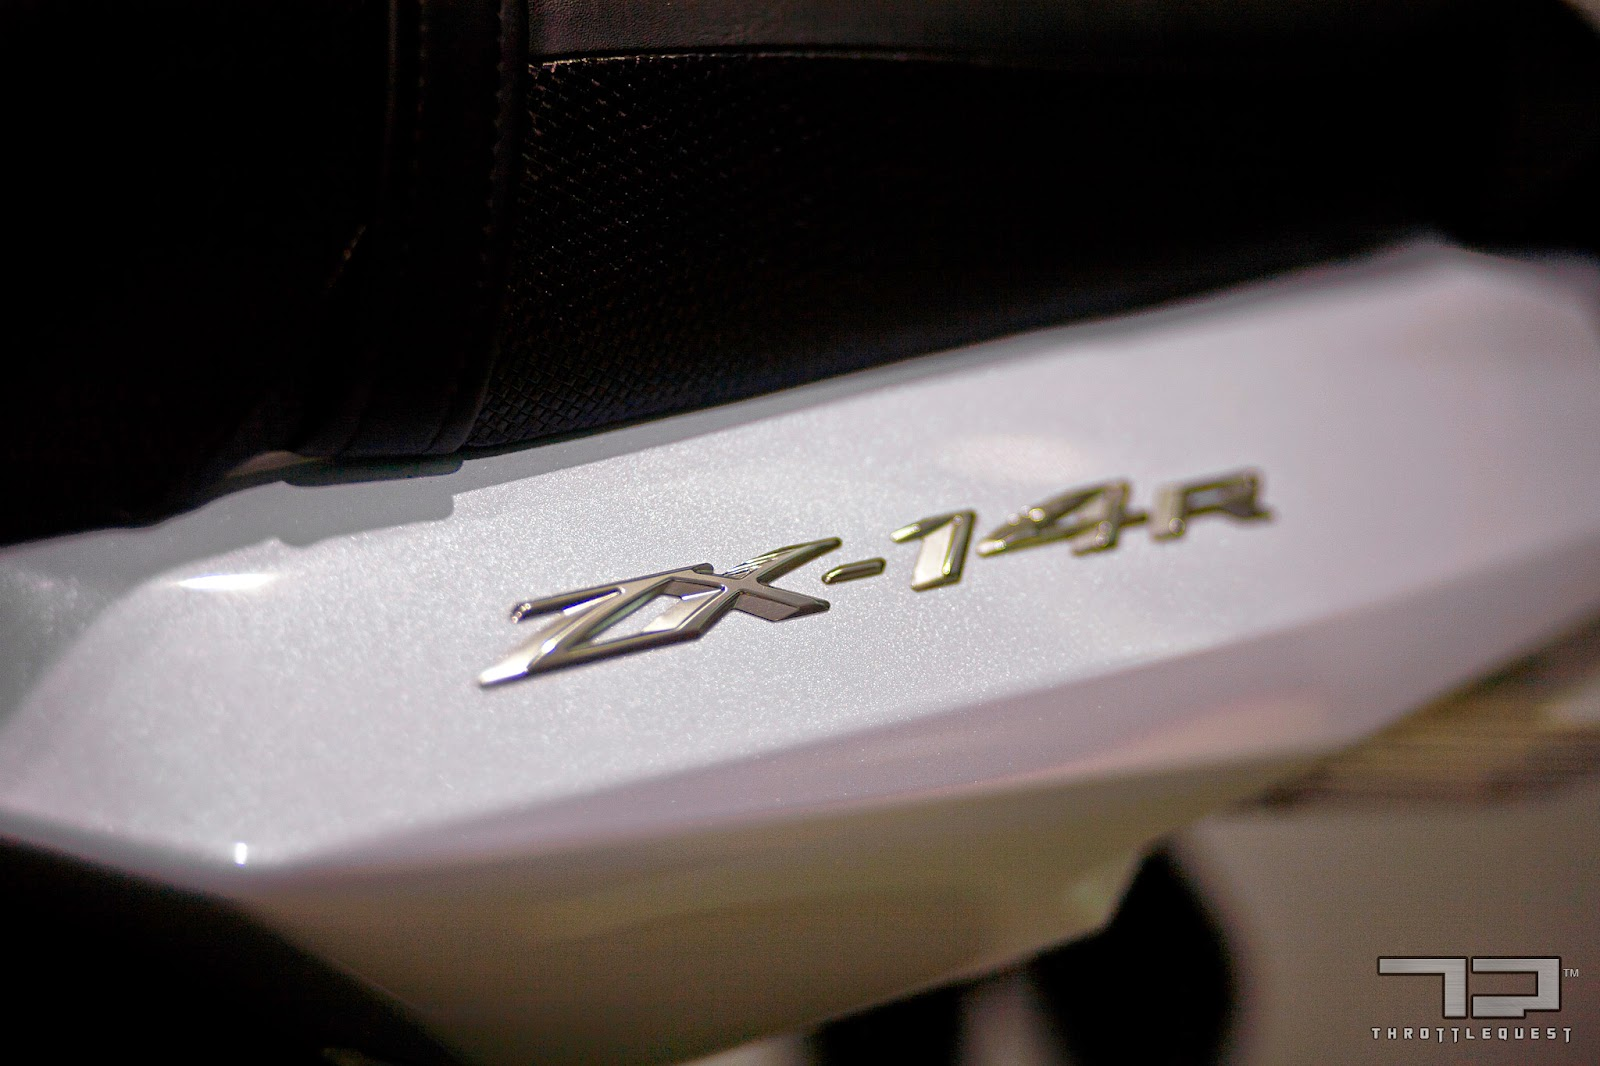 Throttle Quest Kawasaki ZX-14R Pearl White Stardust